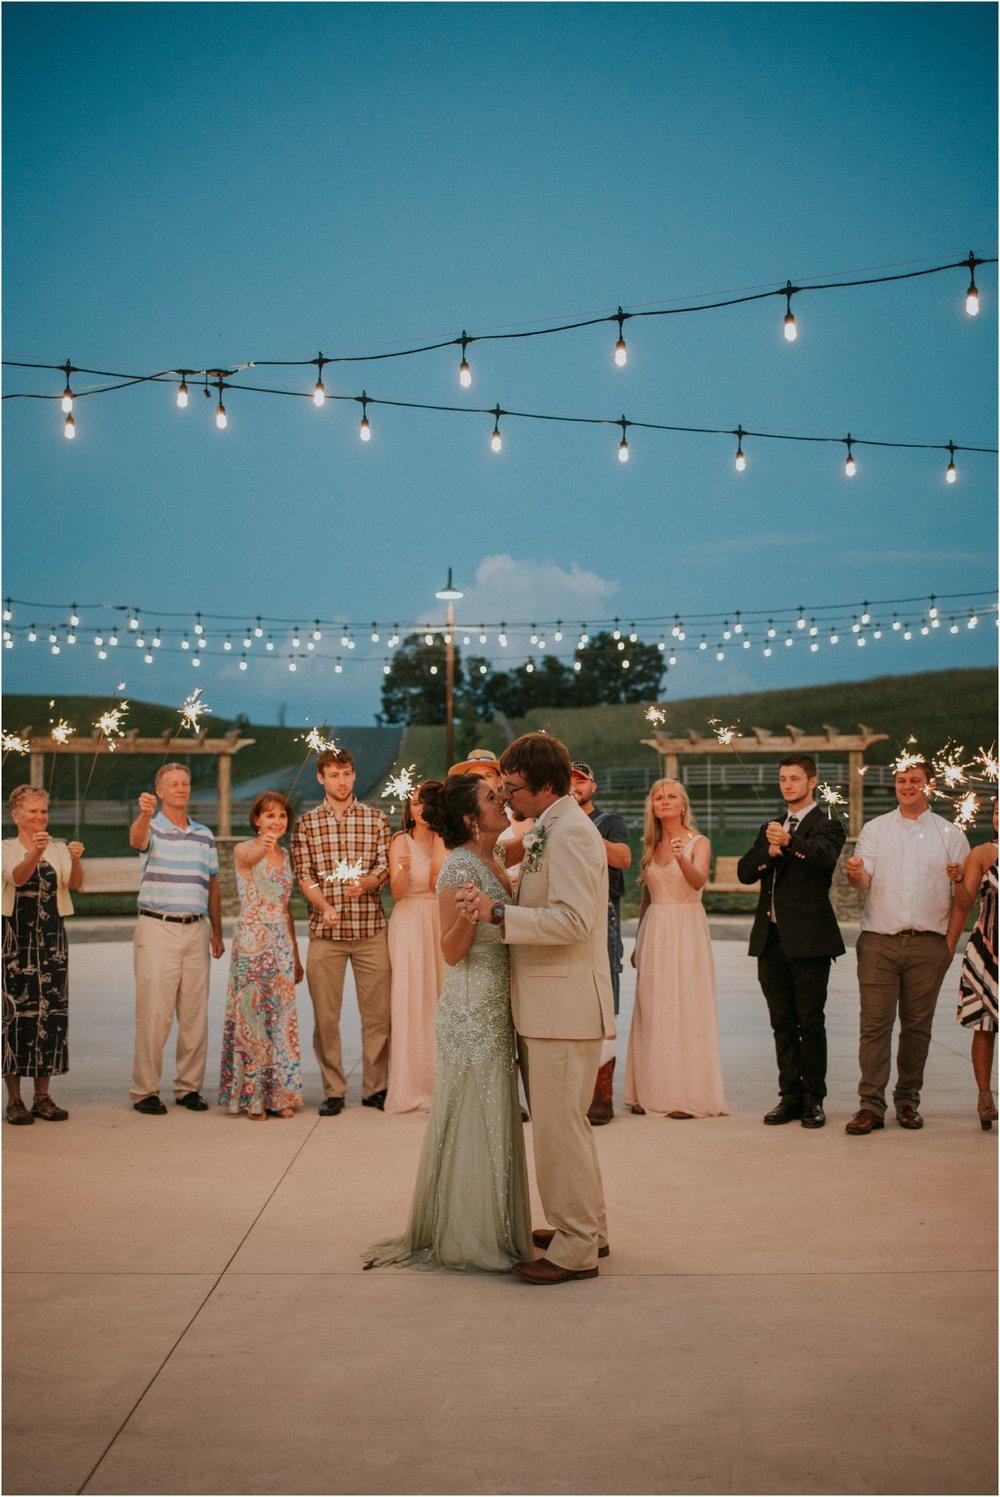 pink-rustic-apple-barn-howe-farms-elegant-summer-wedding-cleveland-tennessee-chattanooga-georgetown-tn_0180.jpg